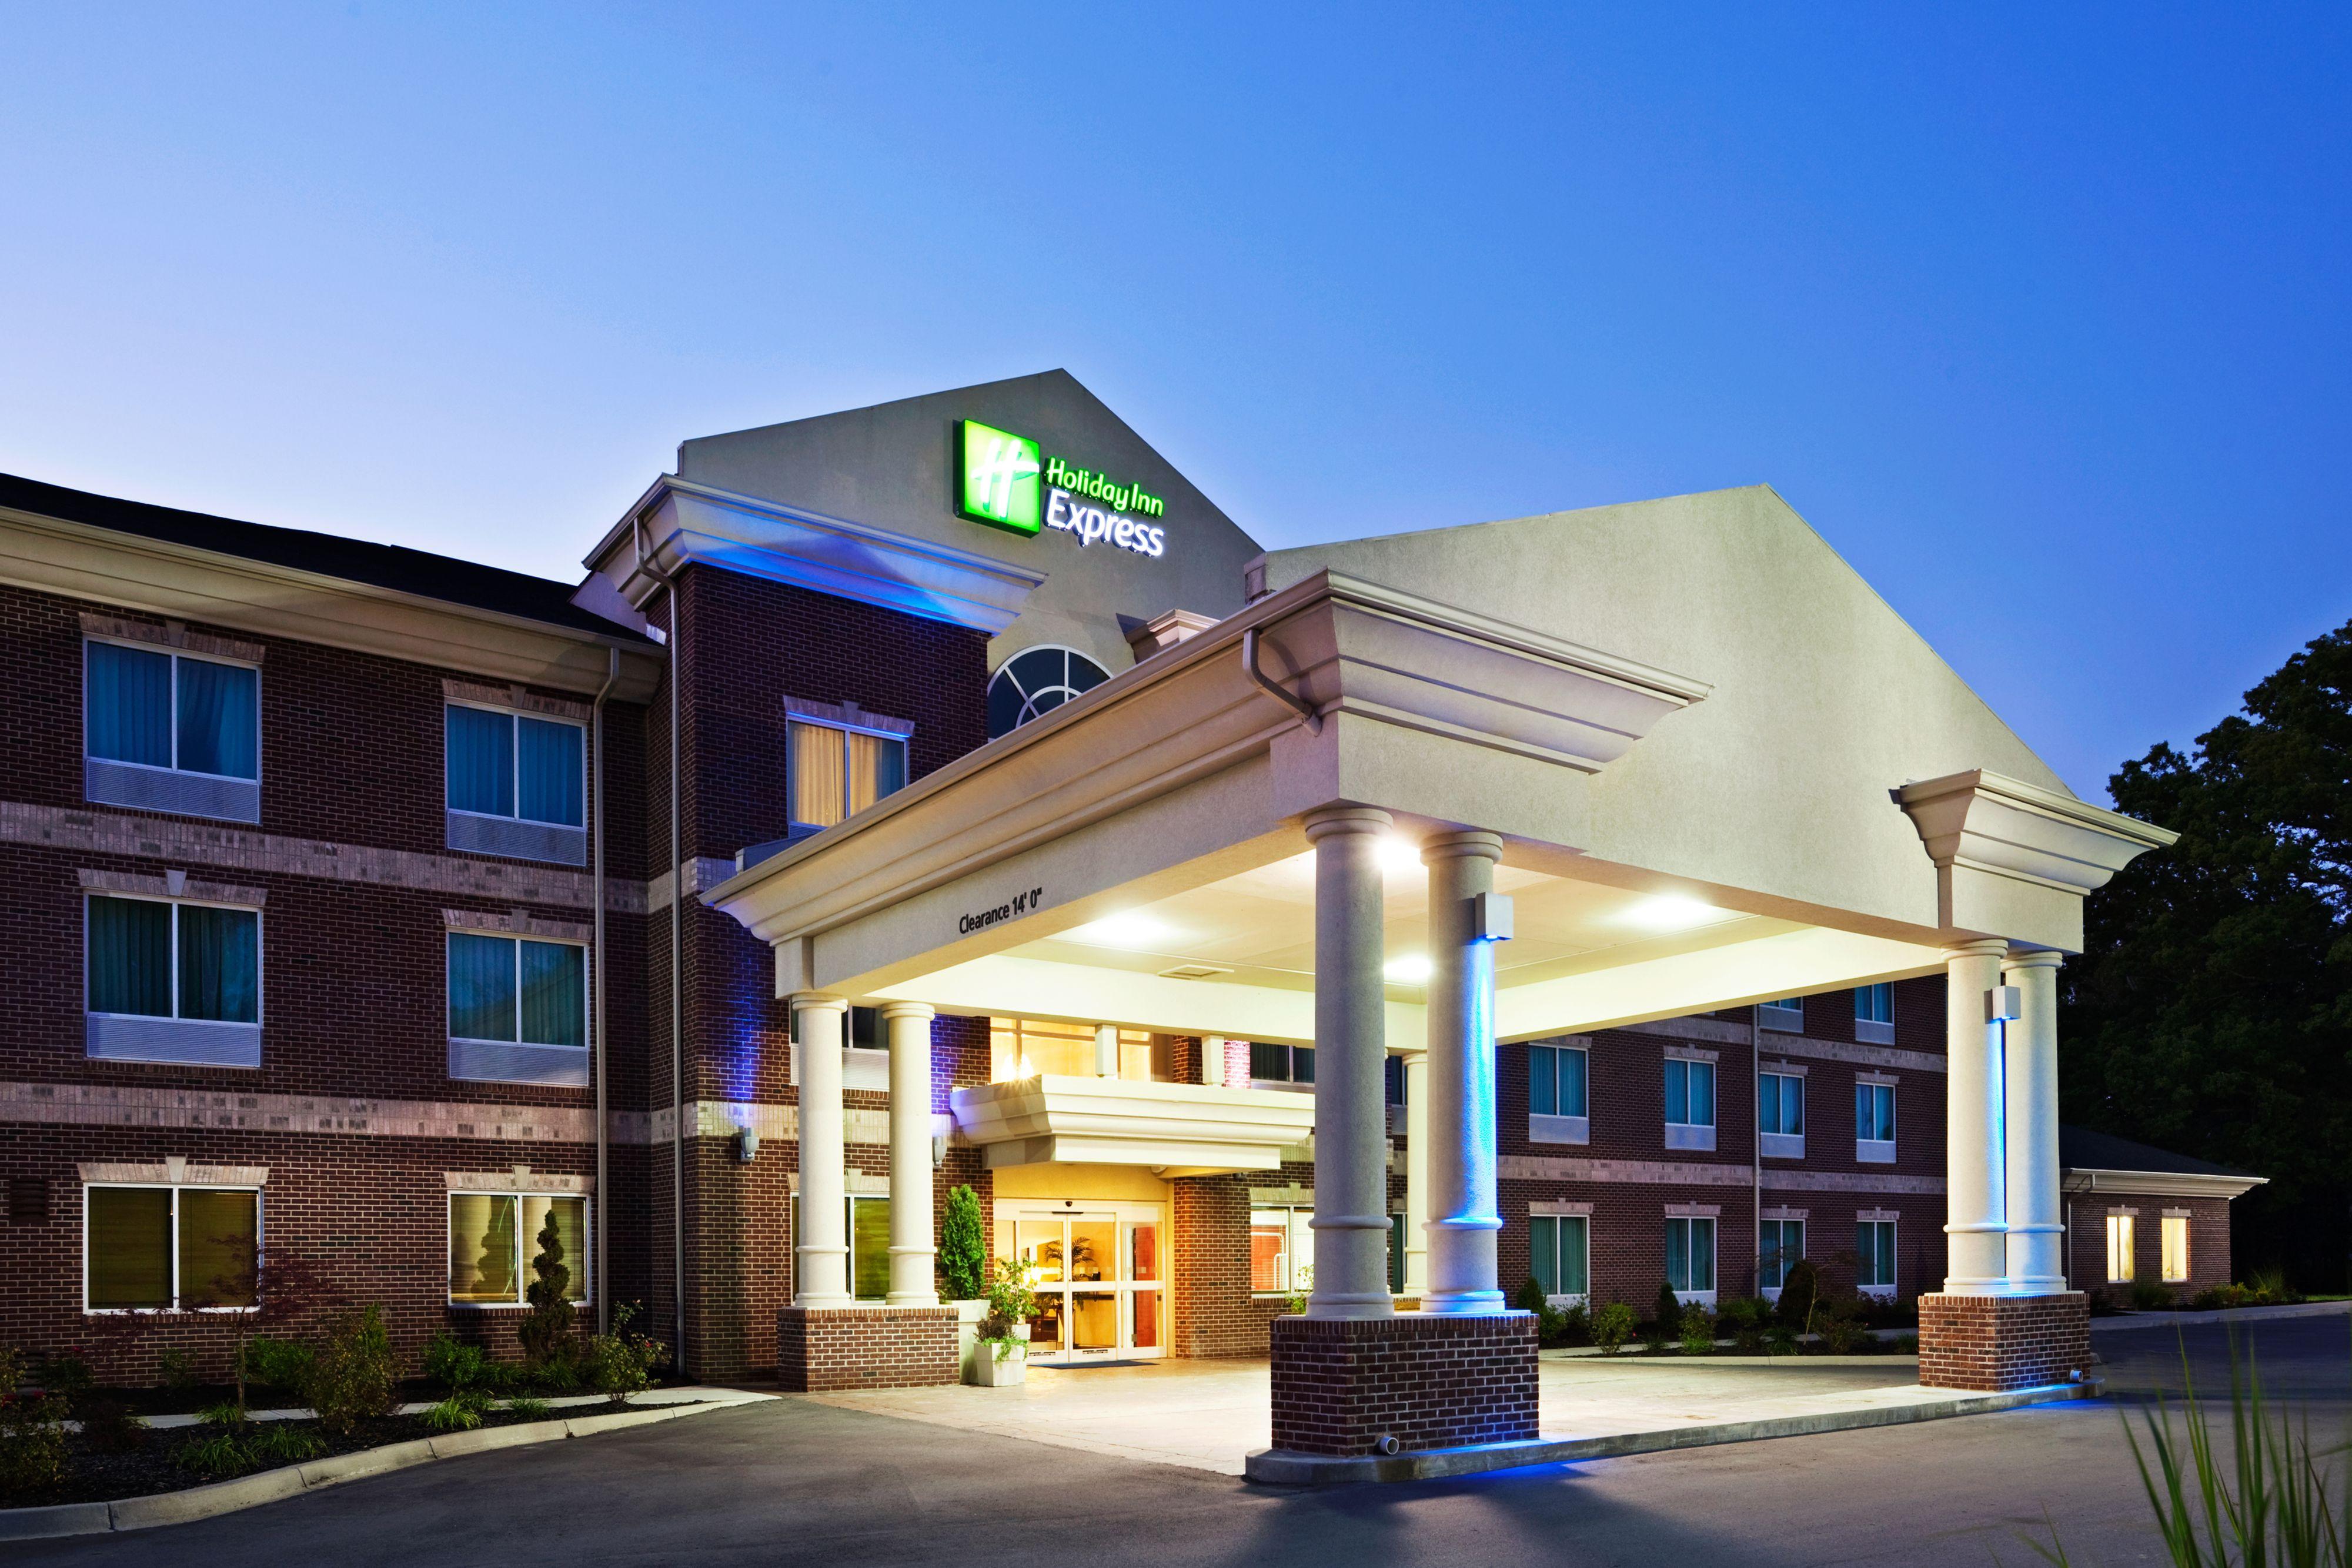 Holiday Inn Express & Suites Carpinteria image 5